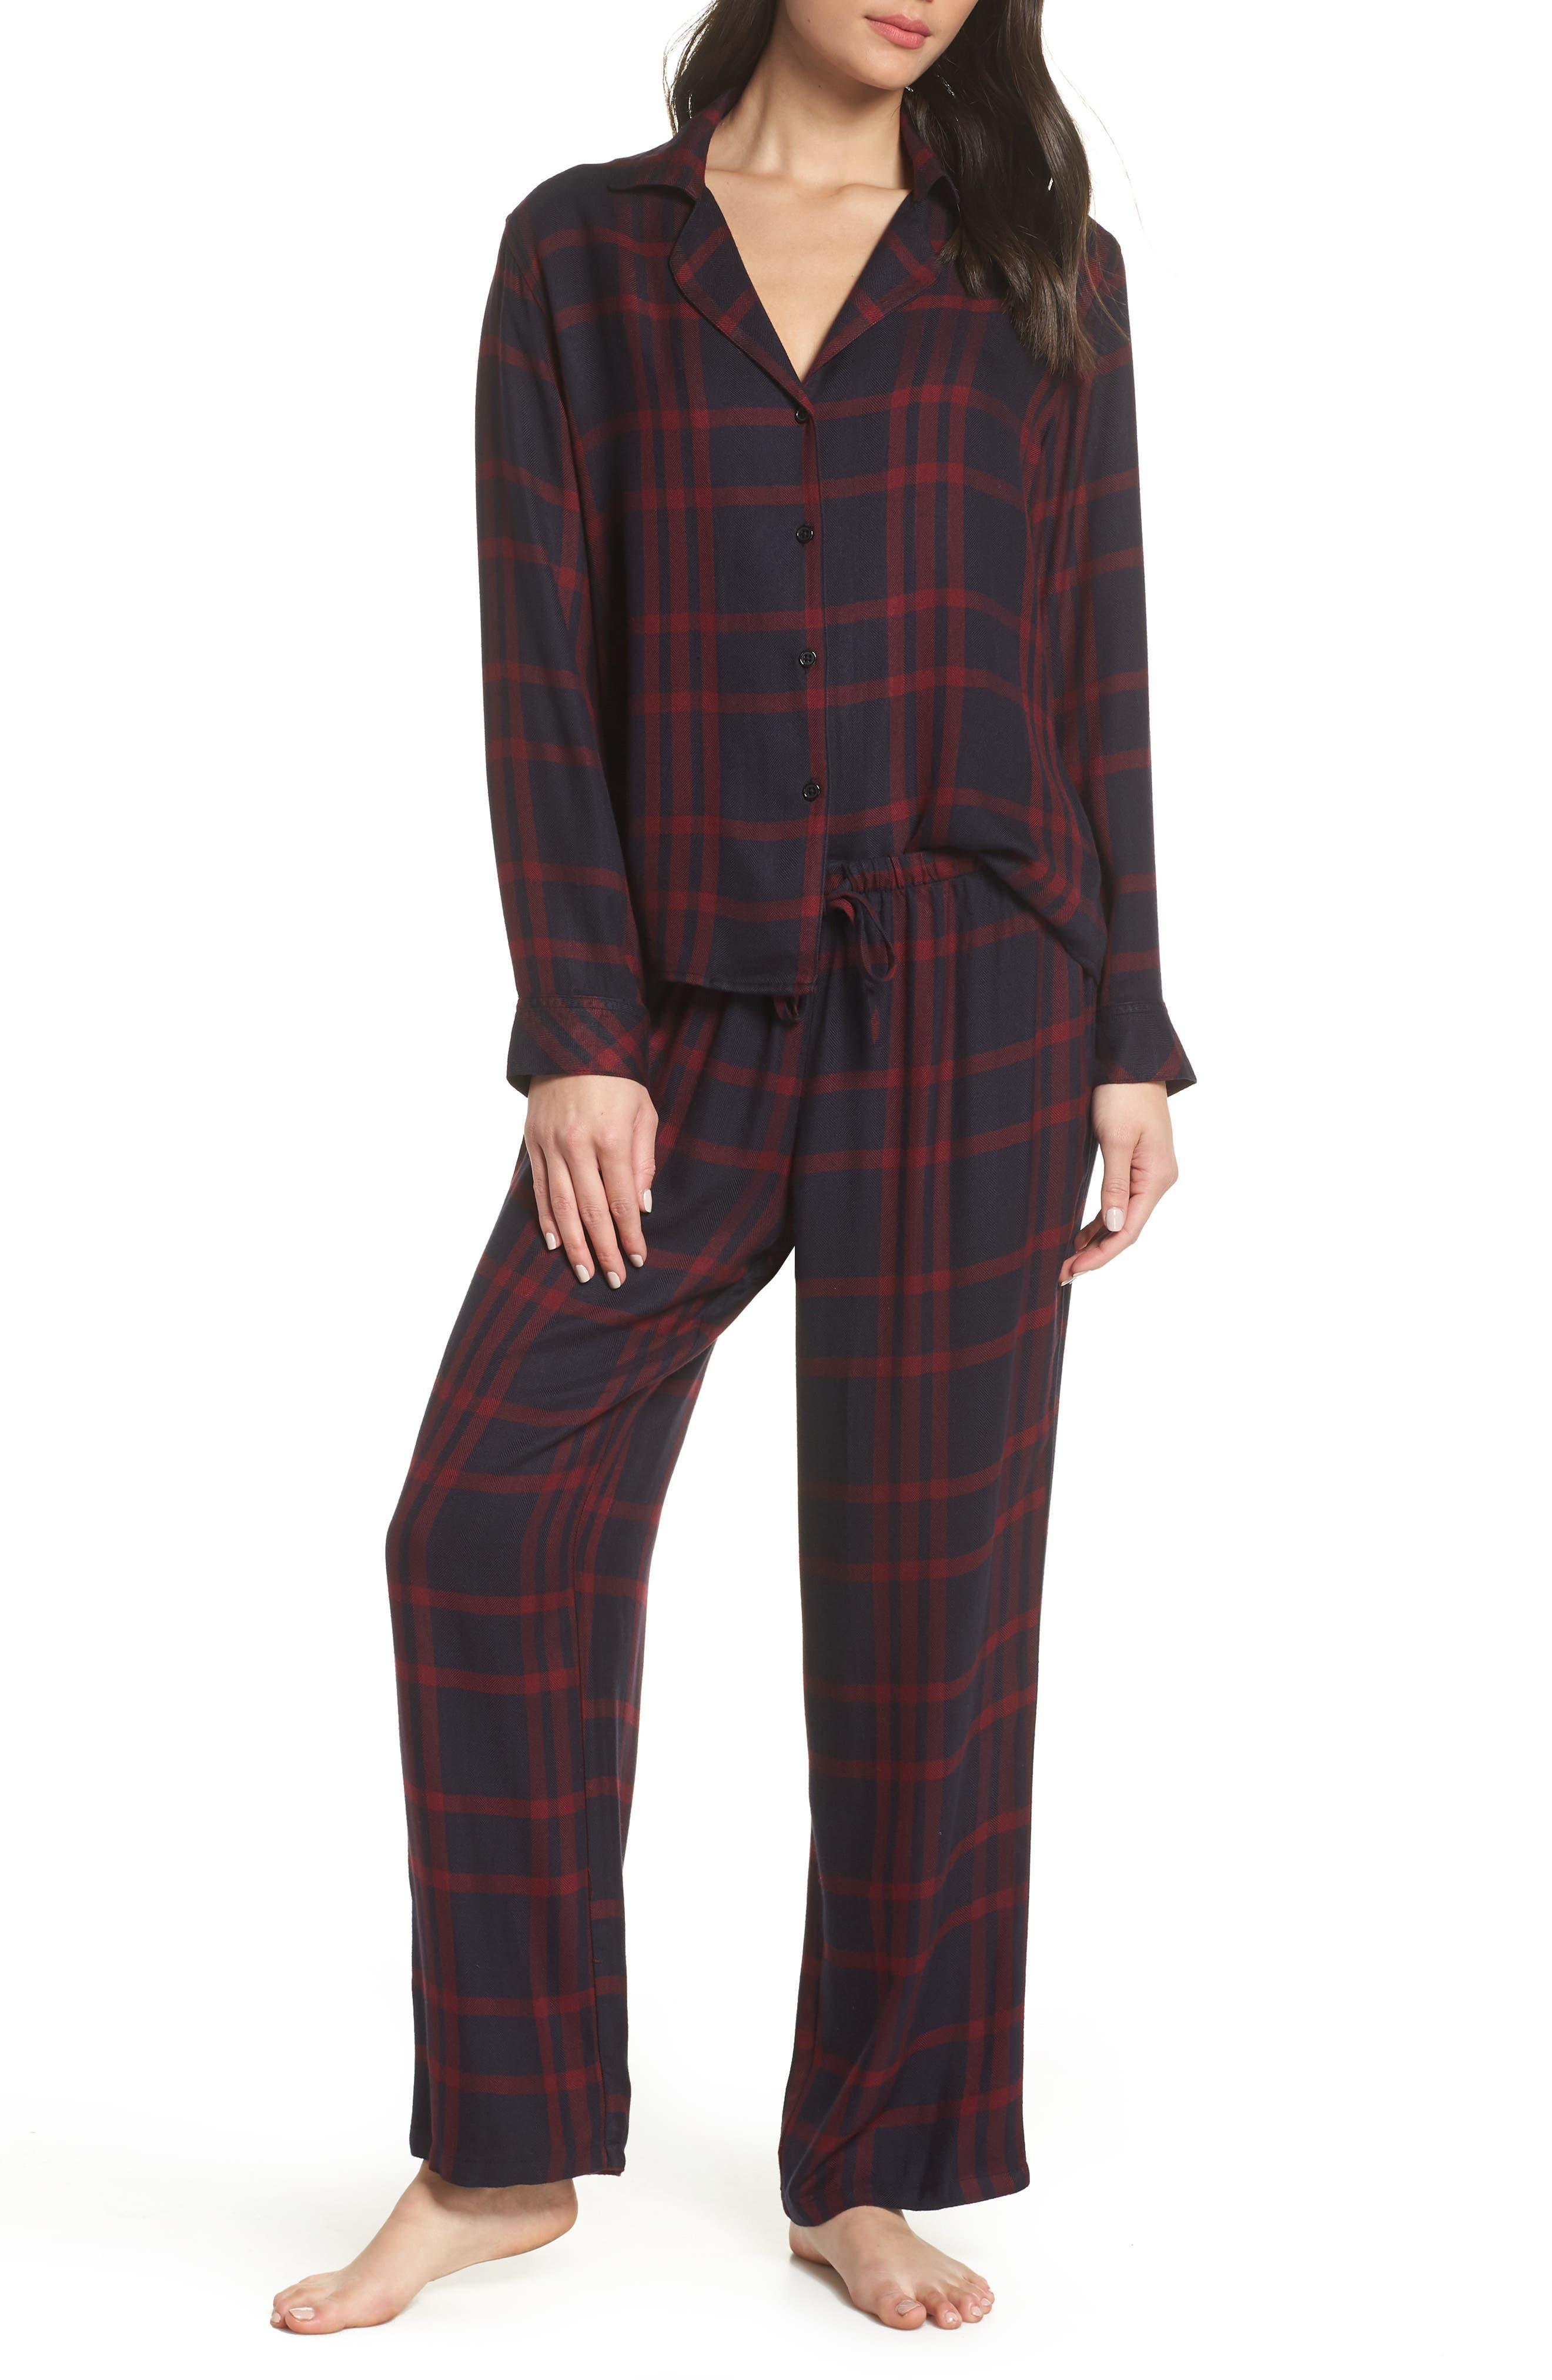 RAILS Two-Piece Plaid Pajama Set in Black Cherry